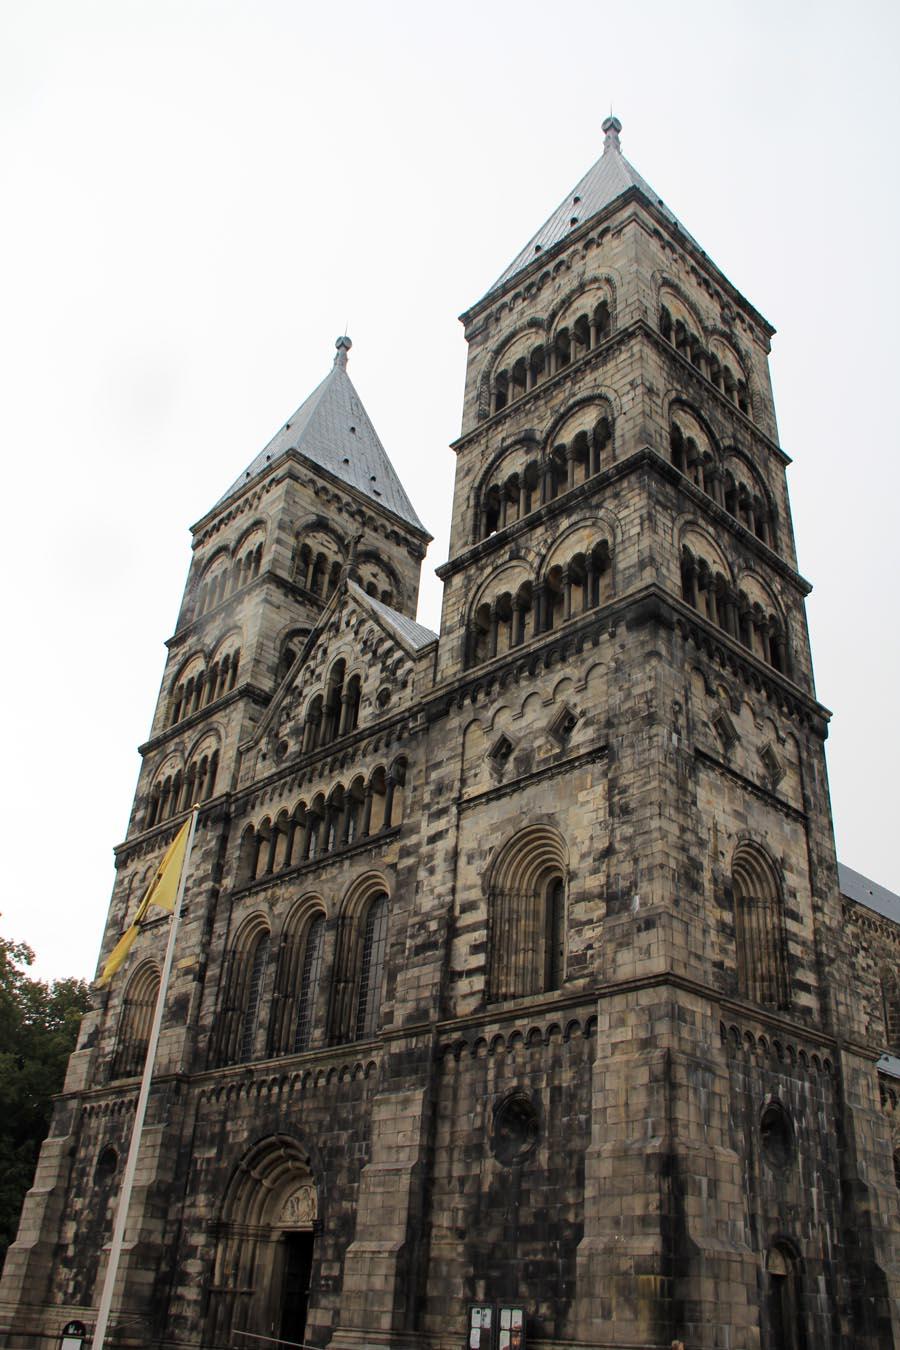 Façade de la cathédrale de Lund